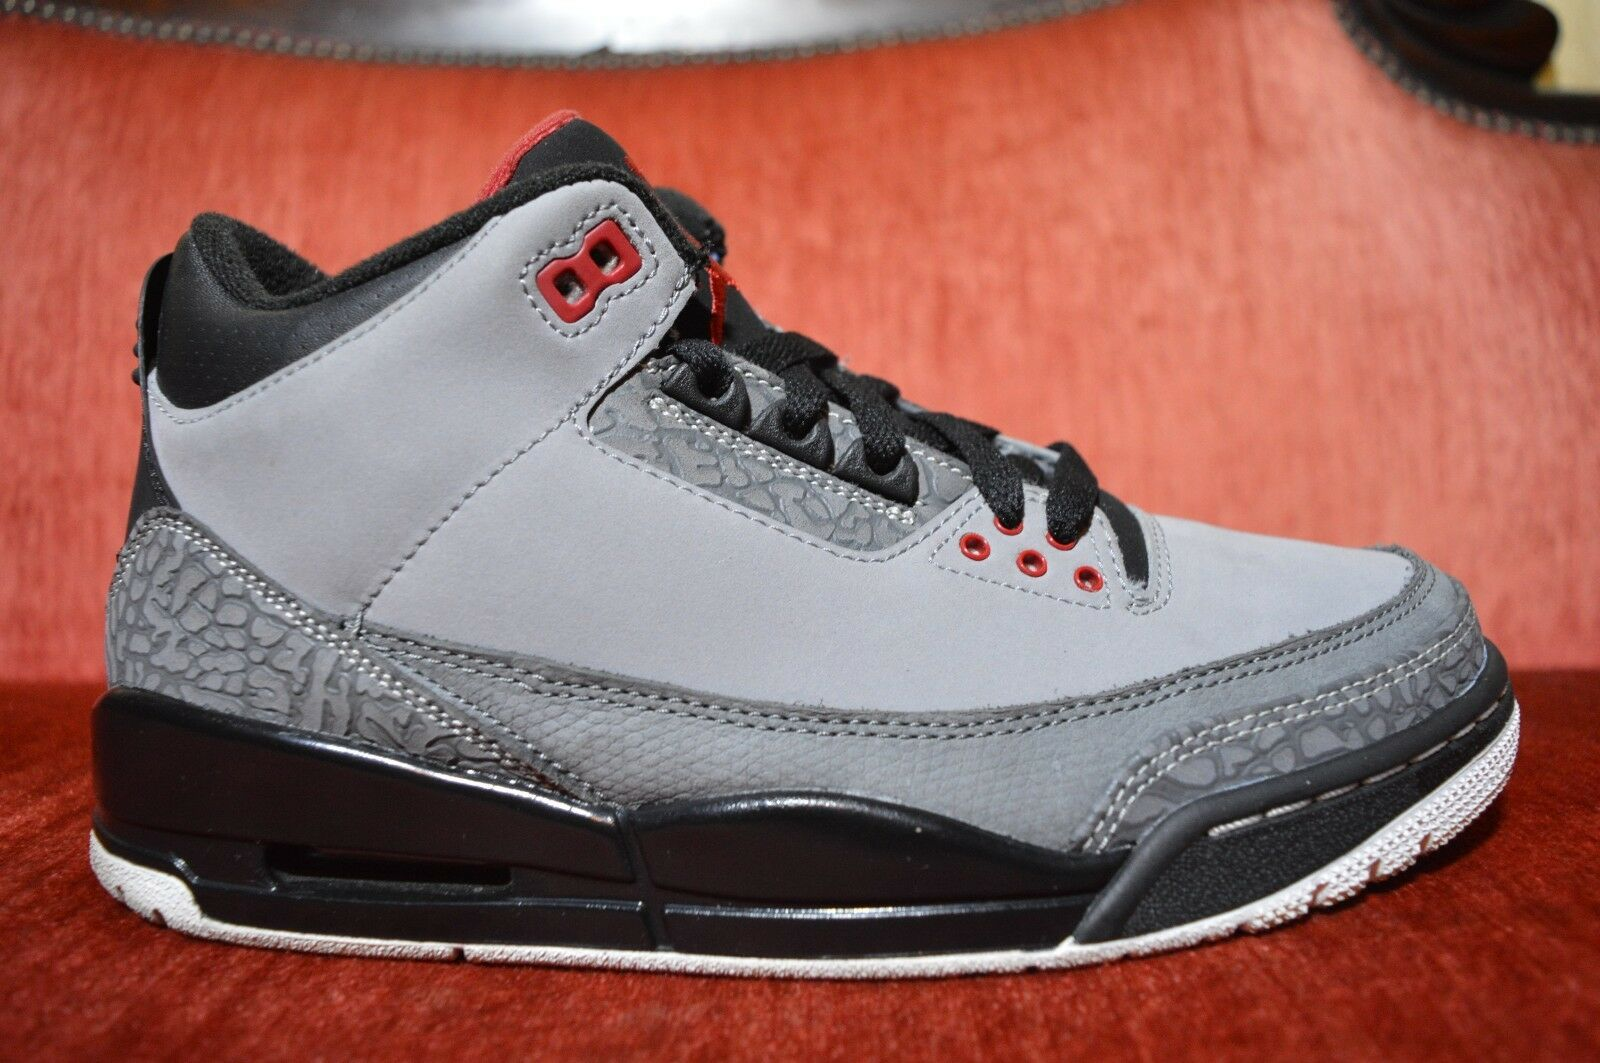 CLEAN Nike Air Jordan 3 III Retro Stealth Cool Grey Black 136064-003 Size 7.5